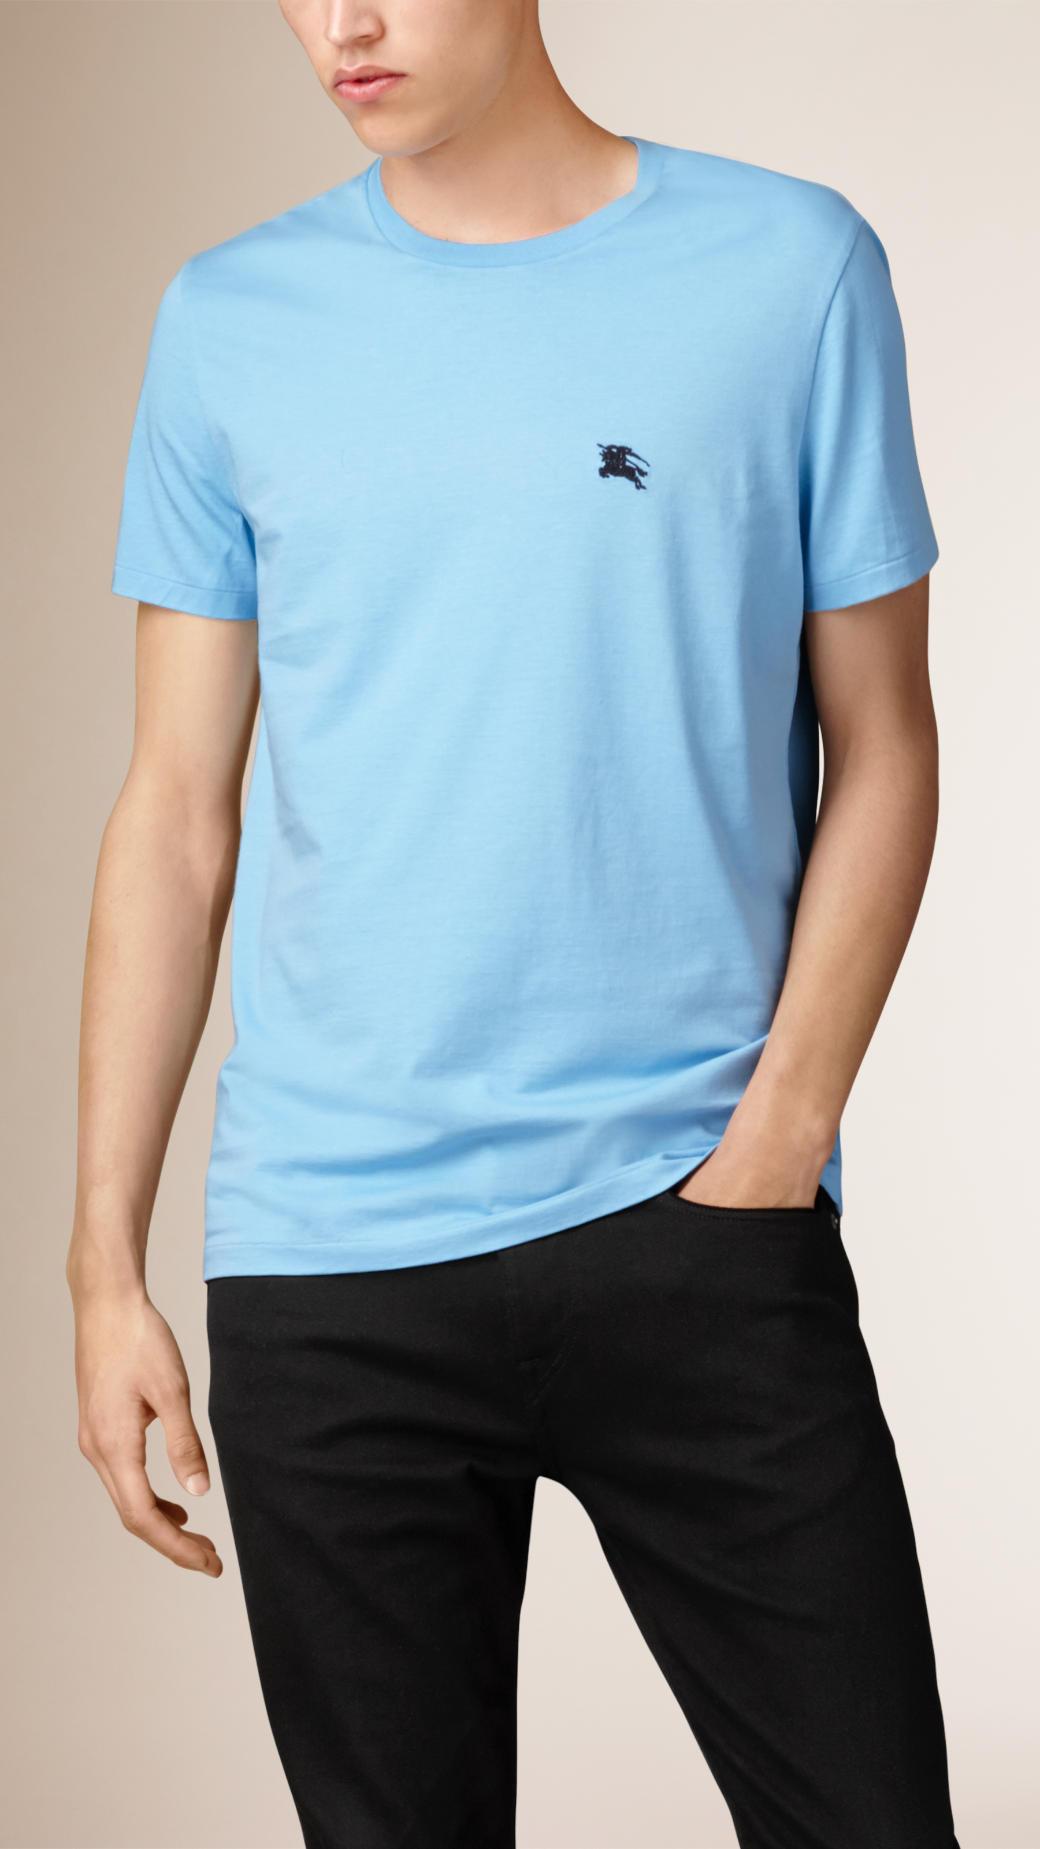 a5e1212a4 Lyst - Burberry Liquid Soft Cotton T-shirt Powder Blue in Blue for Men